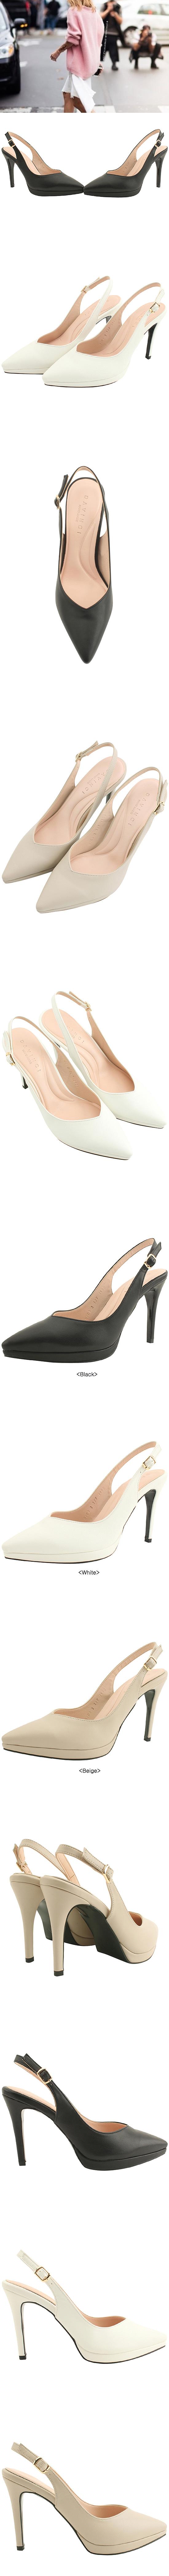 Slingback Gabosi Stiletto High Heel Beige